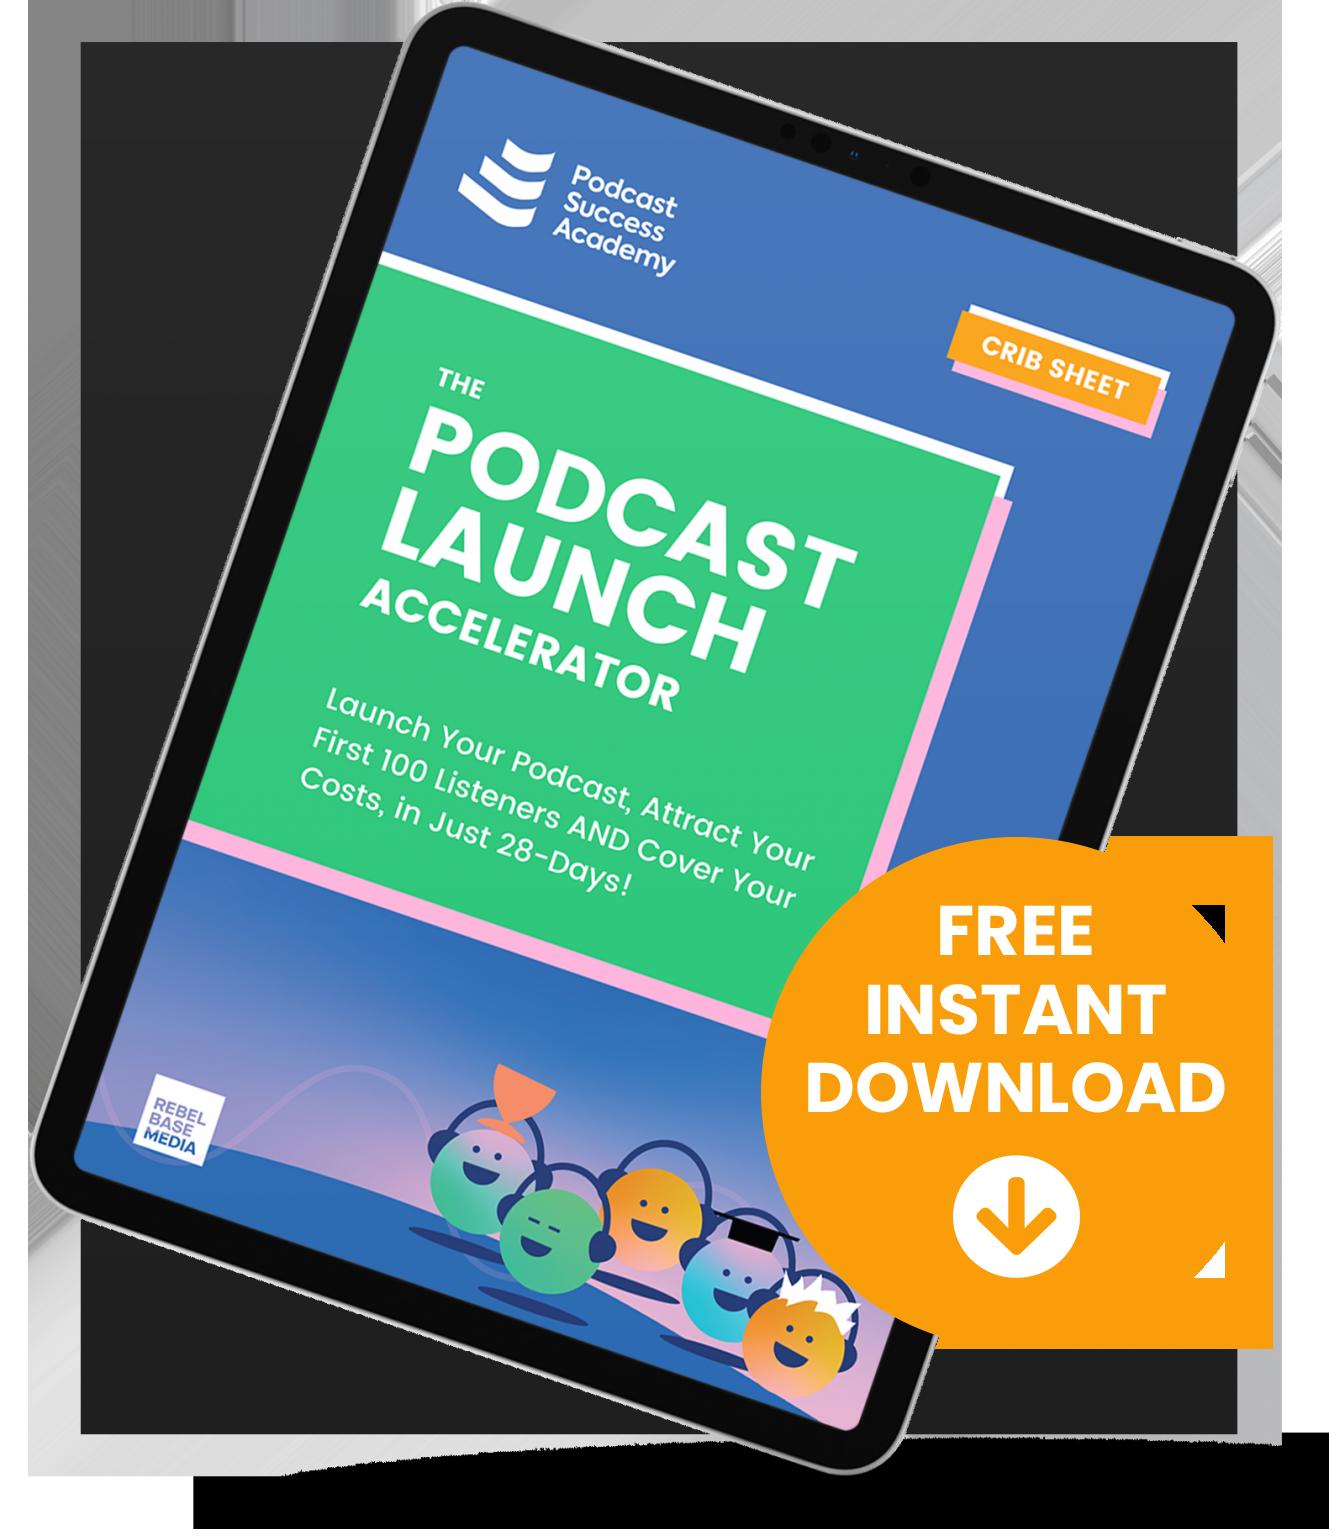 podcast-launch-accelerator-crib-sheet-copy-1329x1536 copy